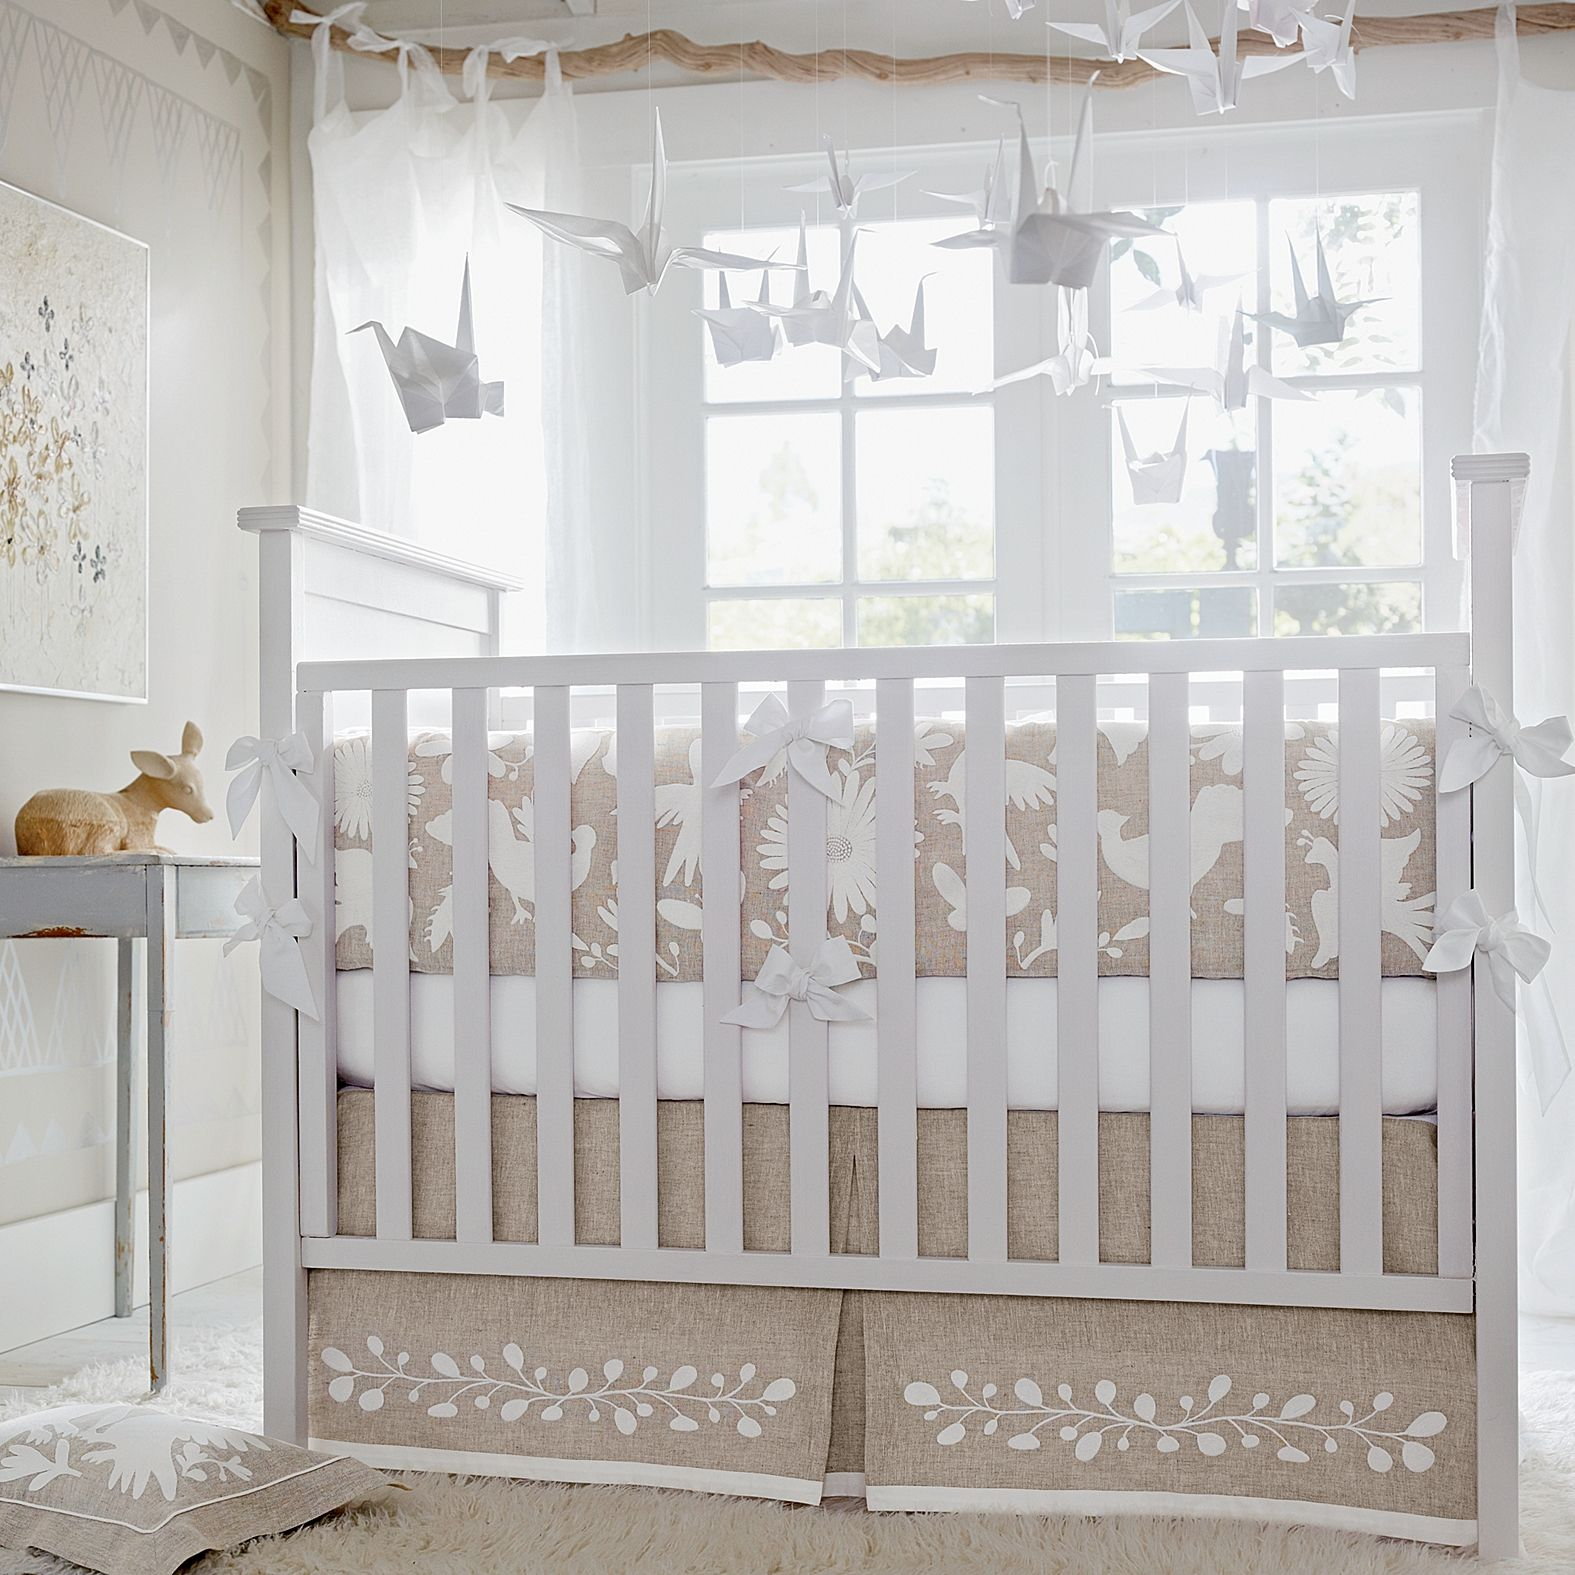 Serena Lily Marlo Crib Bedding Collection For Baby Nursery